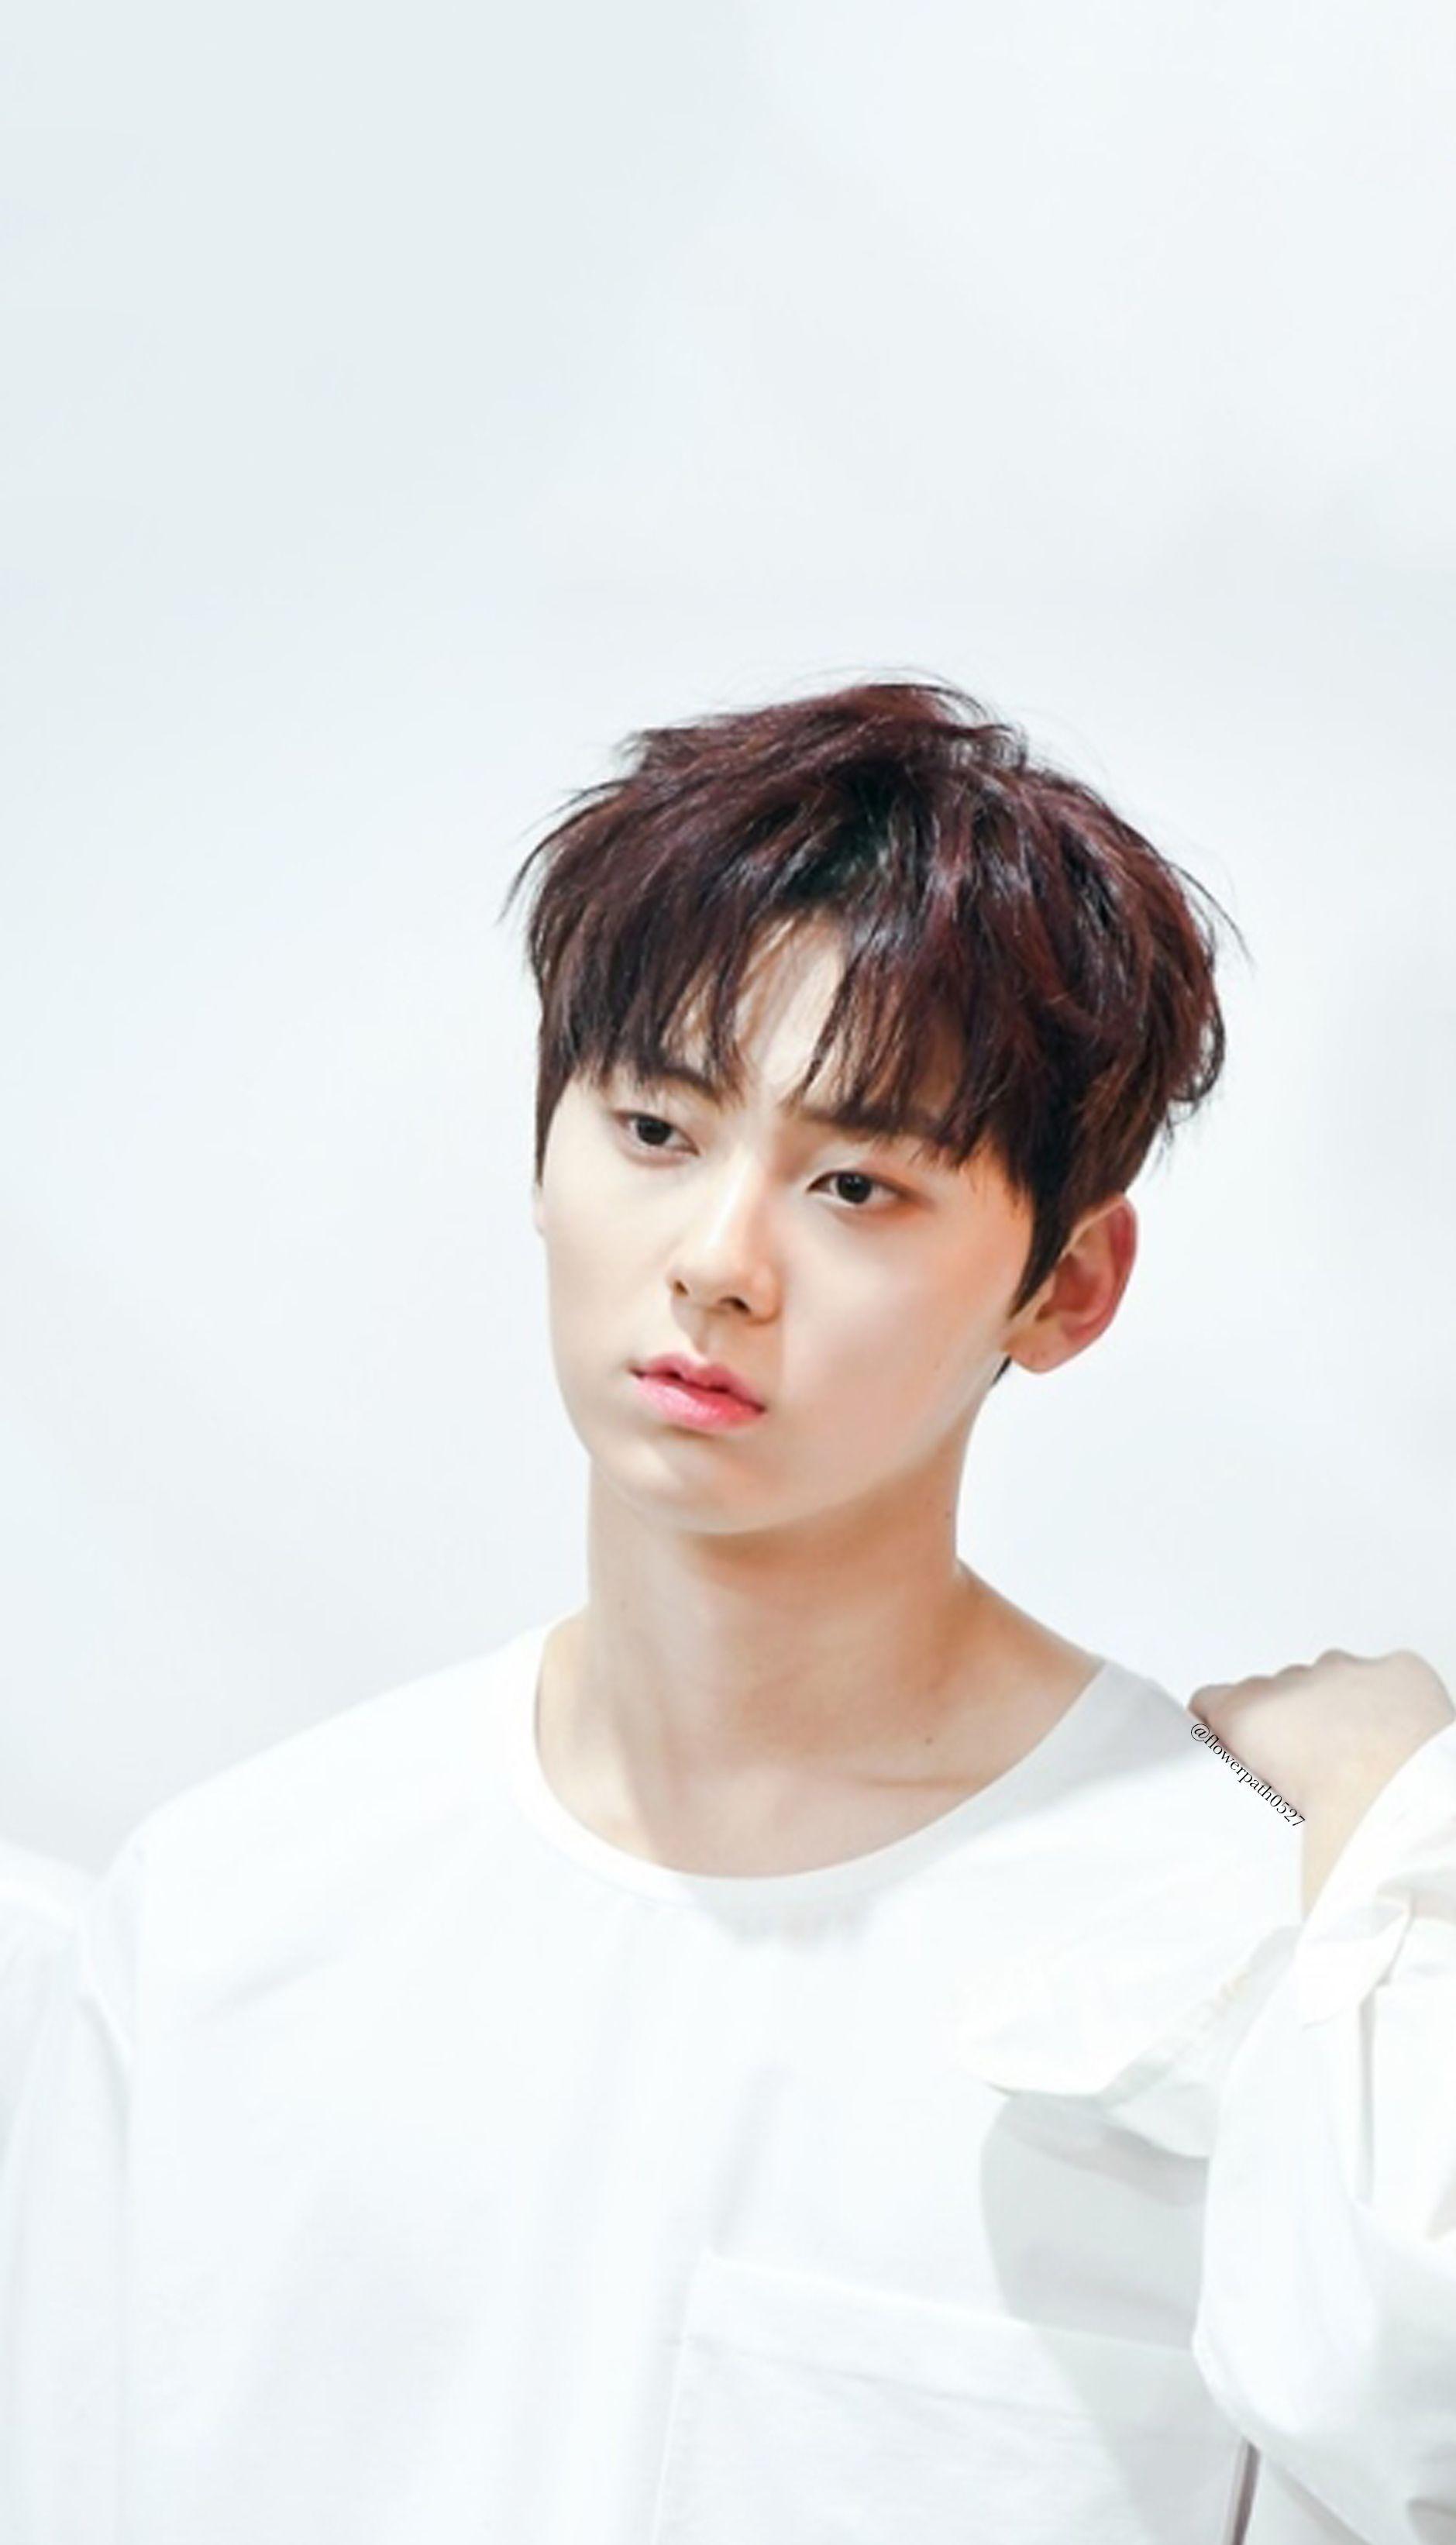 Wanna One x STAR1 Magazine Hwang Minhyun Wallpaper Hwang minhyun 1879x3284